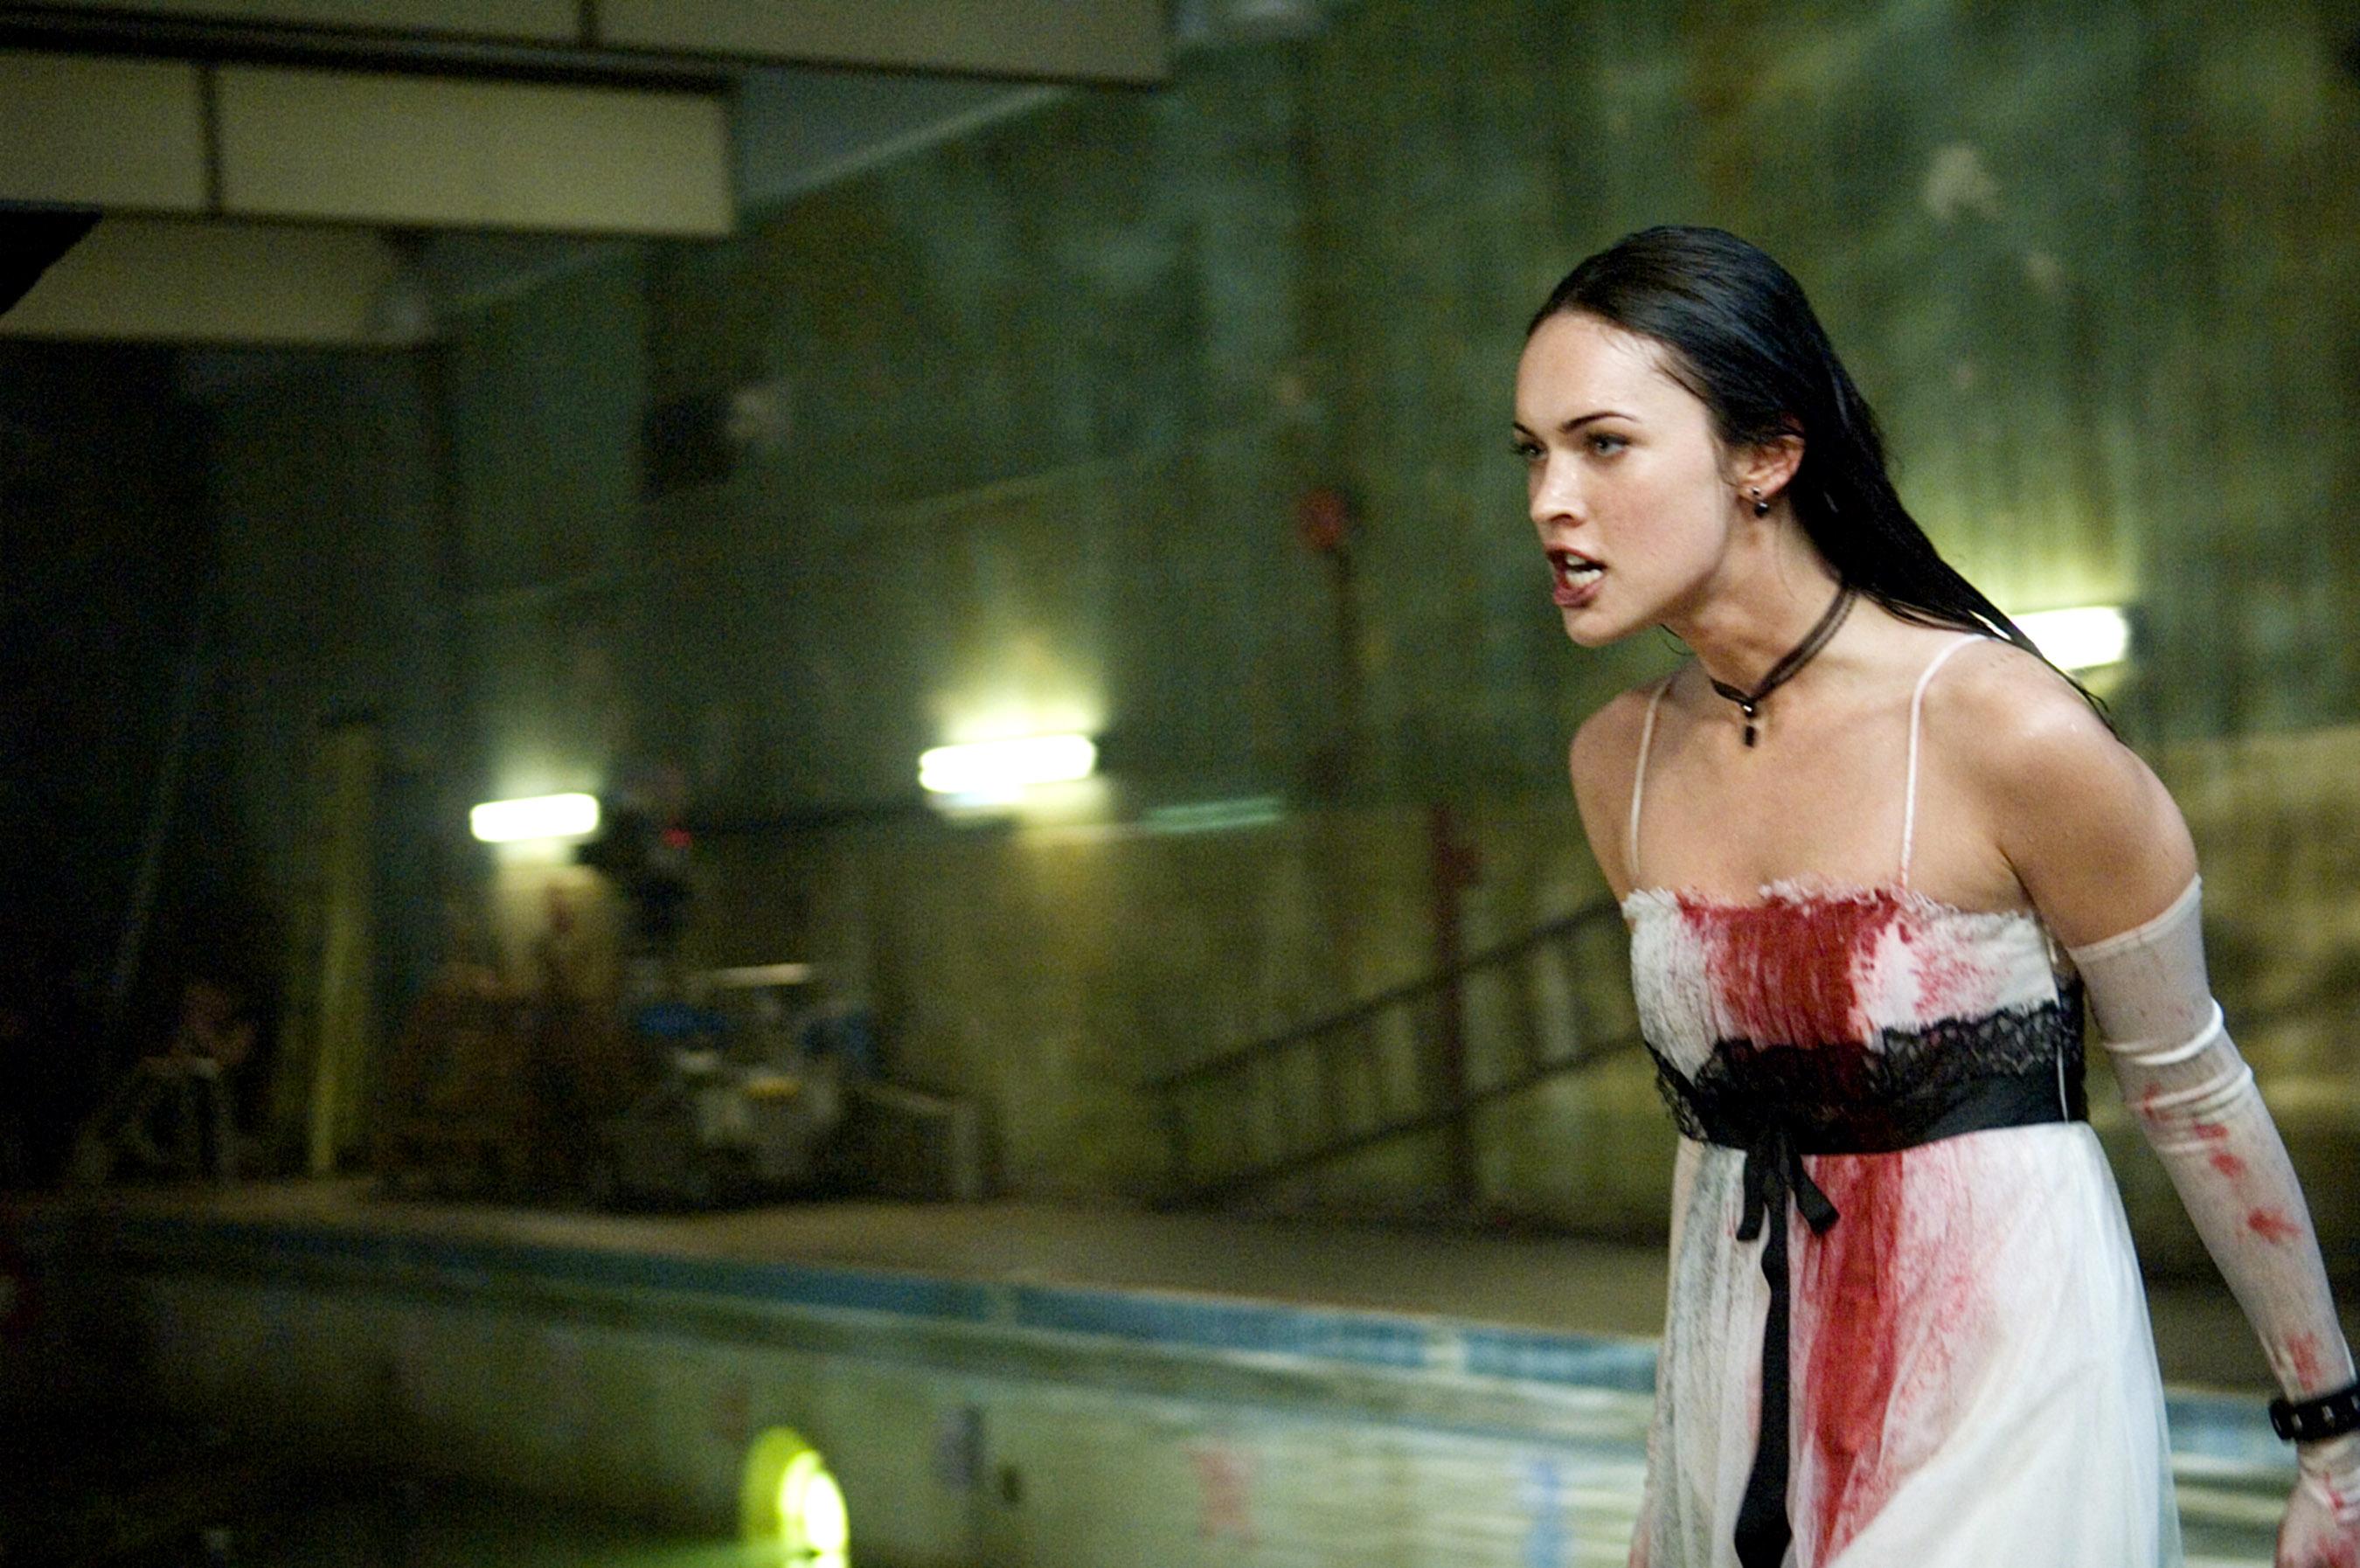 jennifer's body: jennifer yells in her white bloodied dress